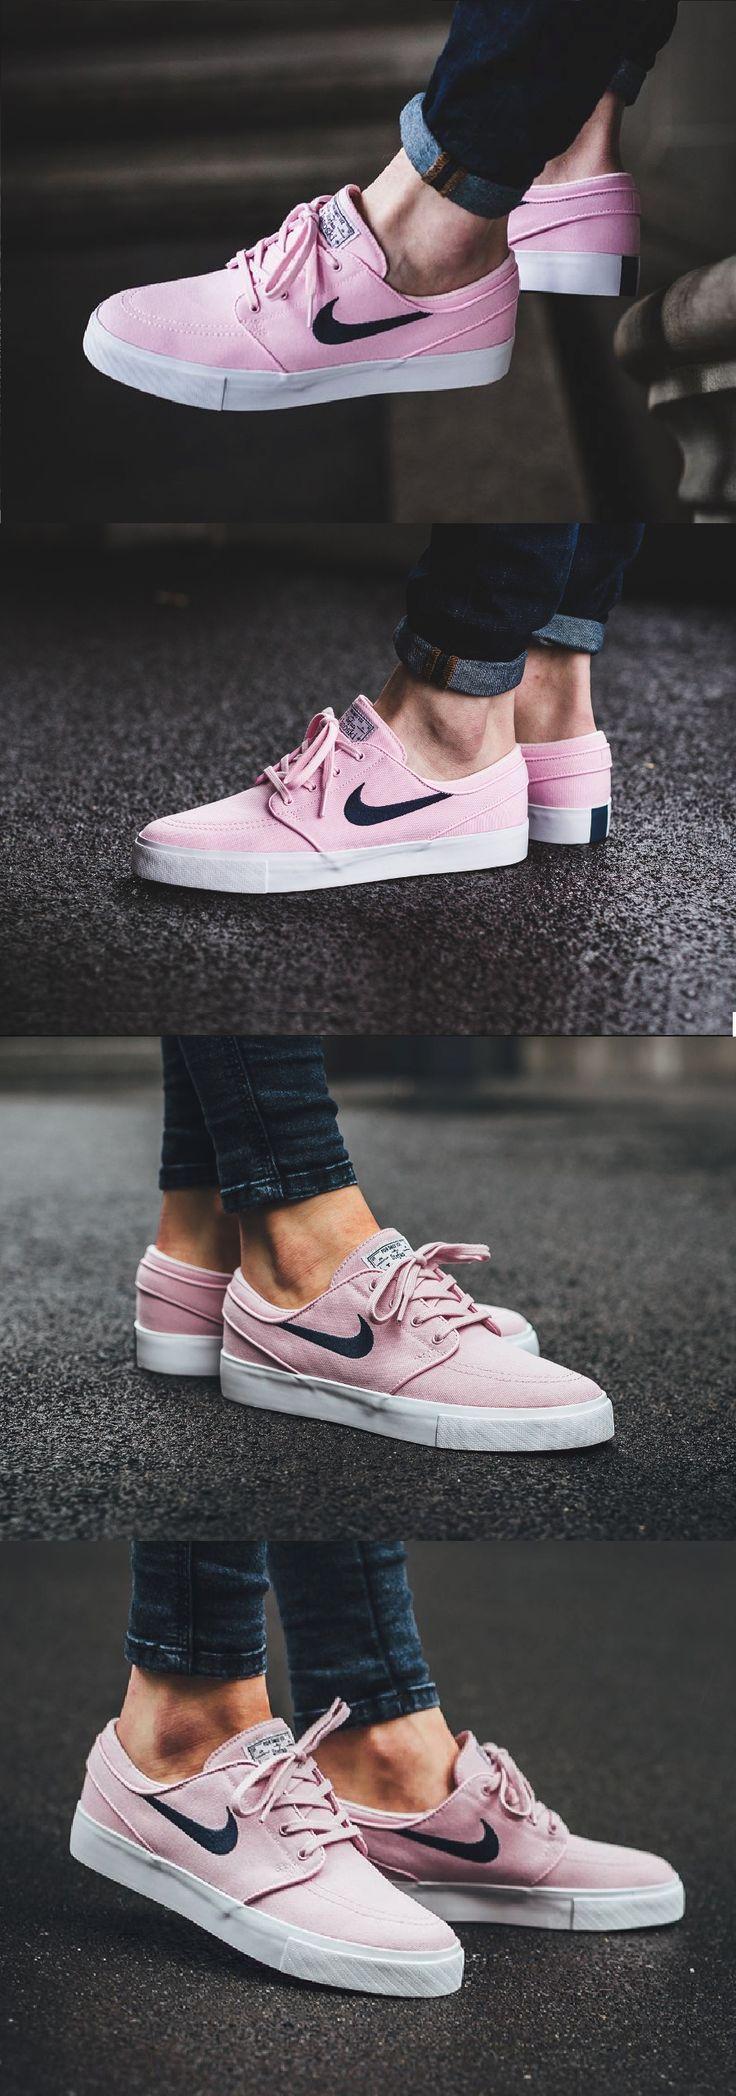 Nike Sb Janoski Prism Pink Nike Shoes Women Nike Sb Shoes Janoski Shoes